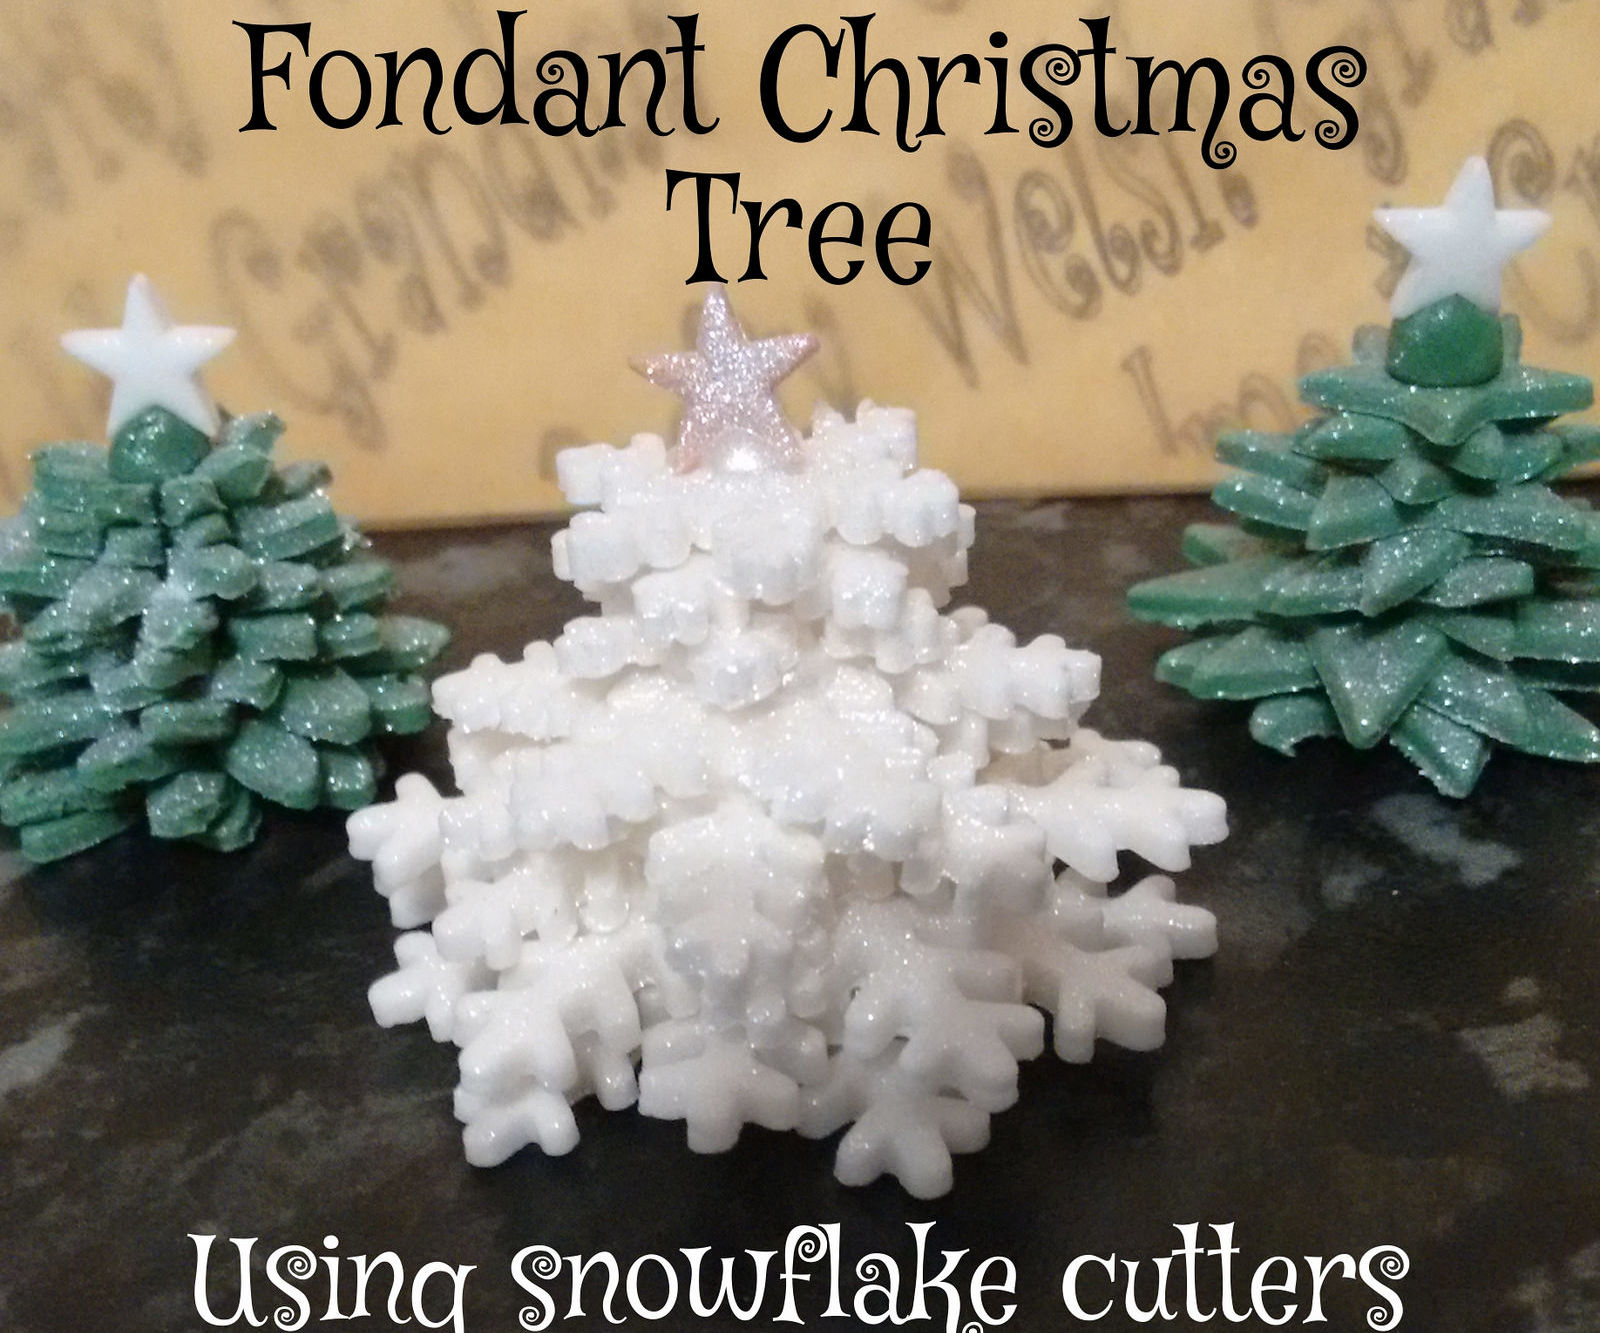 Fondant Snowflake Christmas Tree